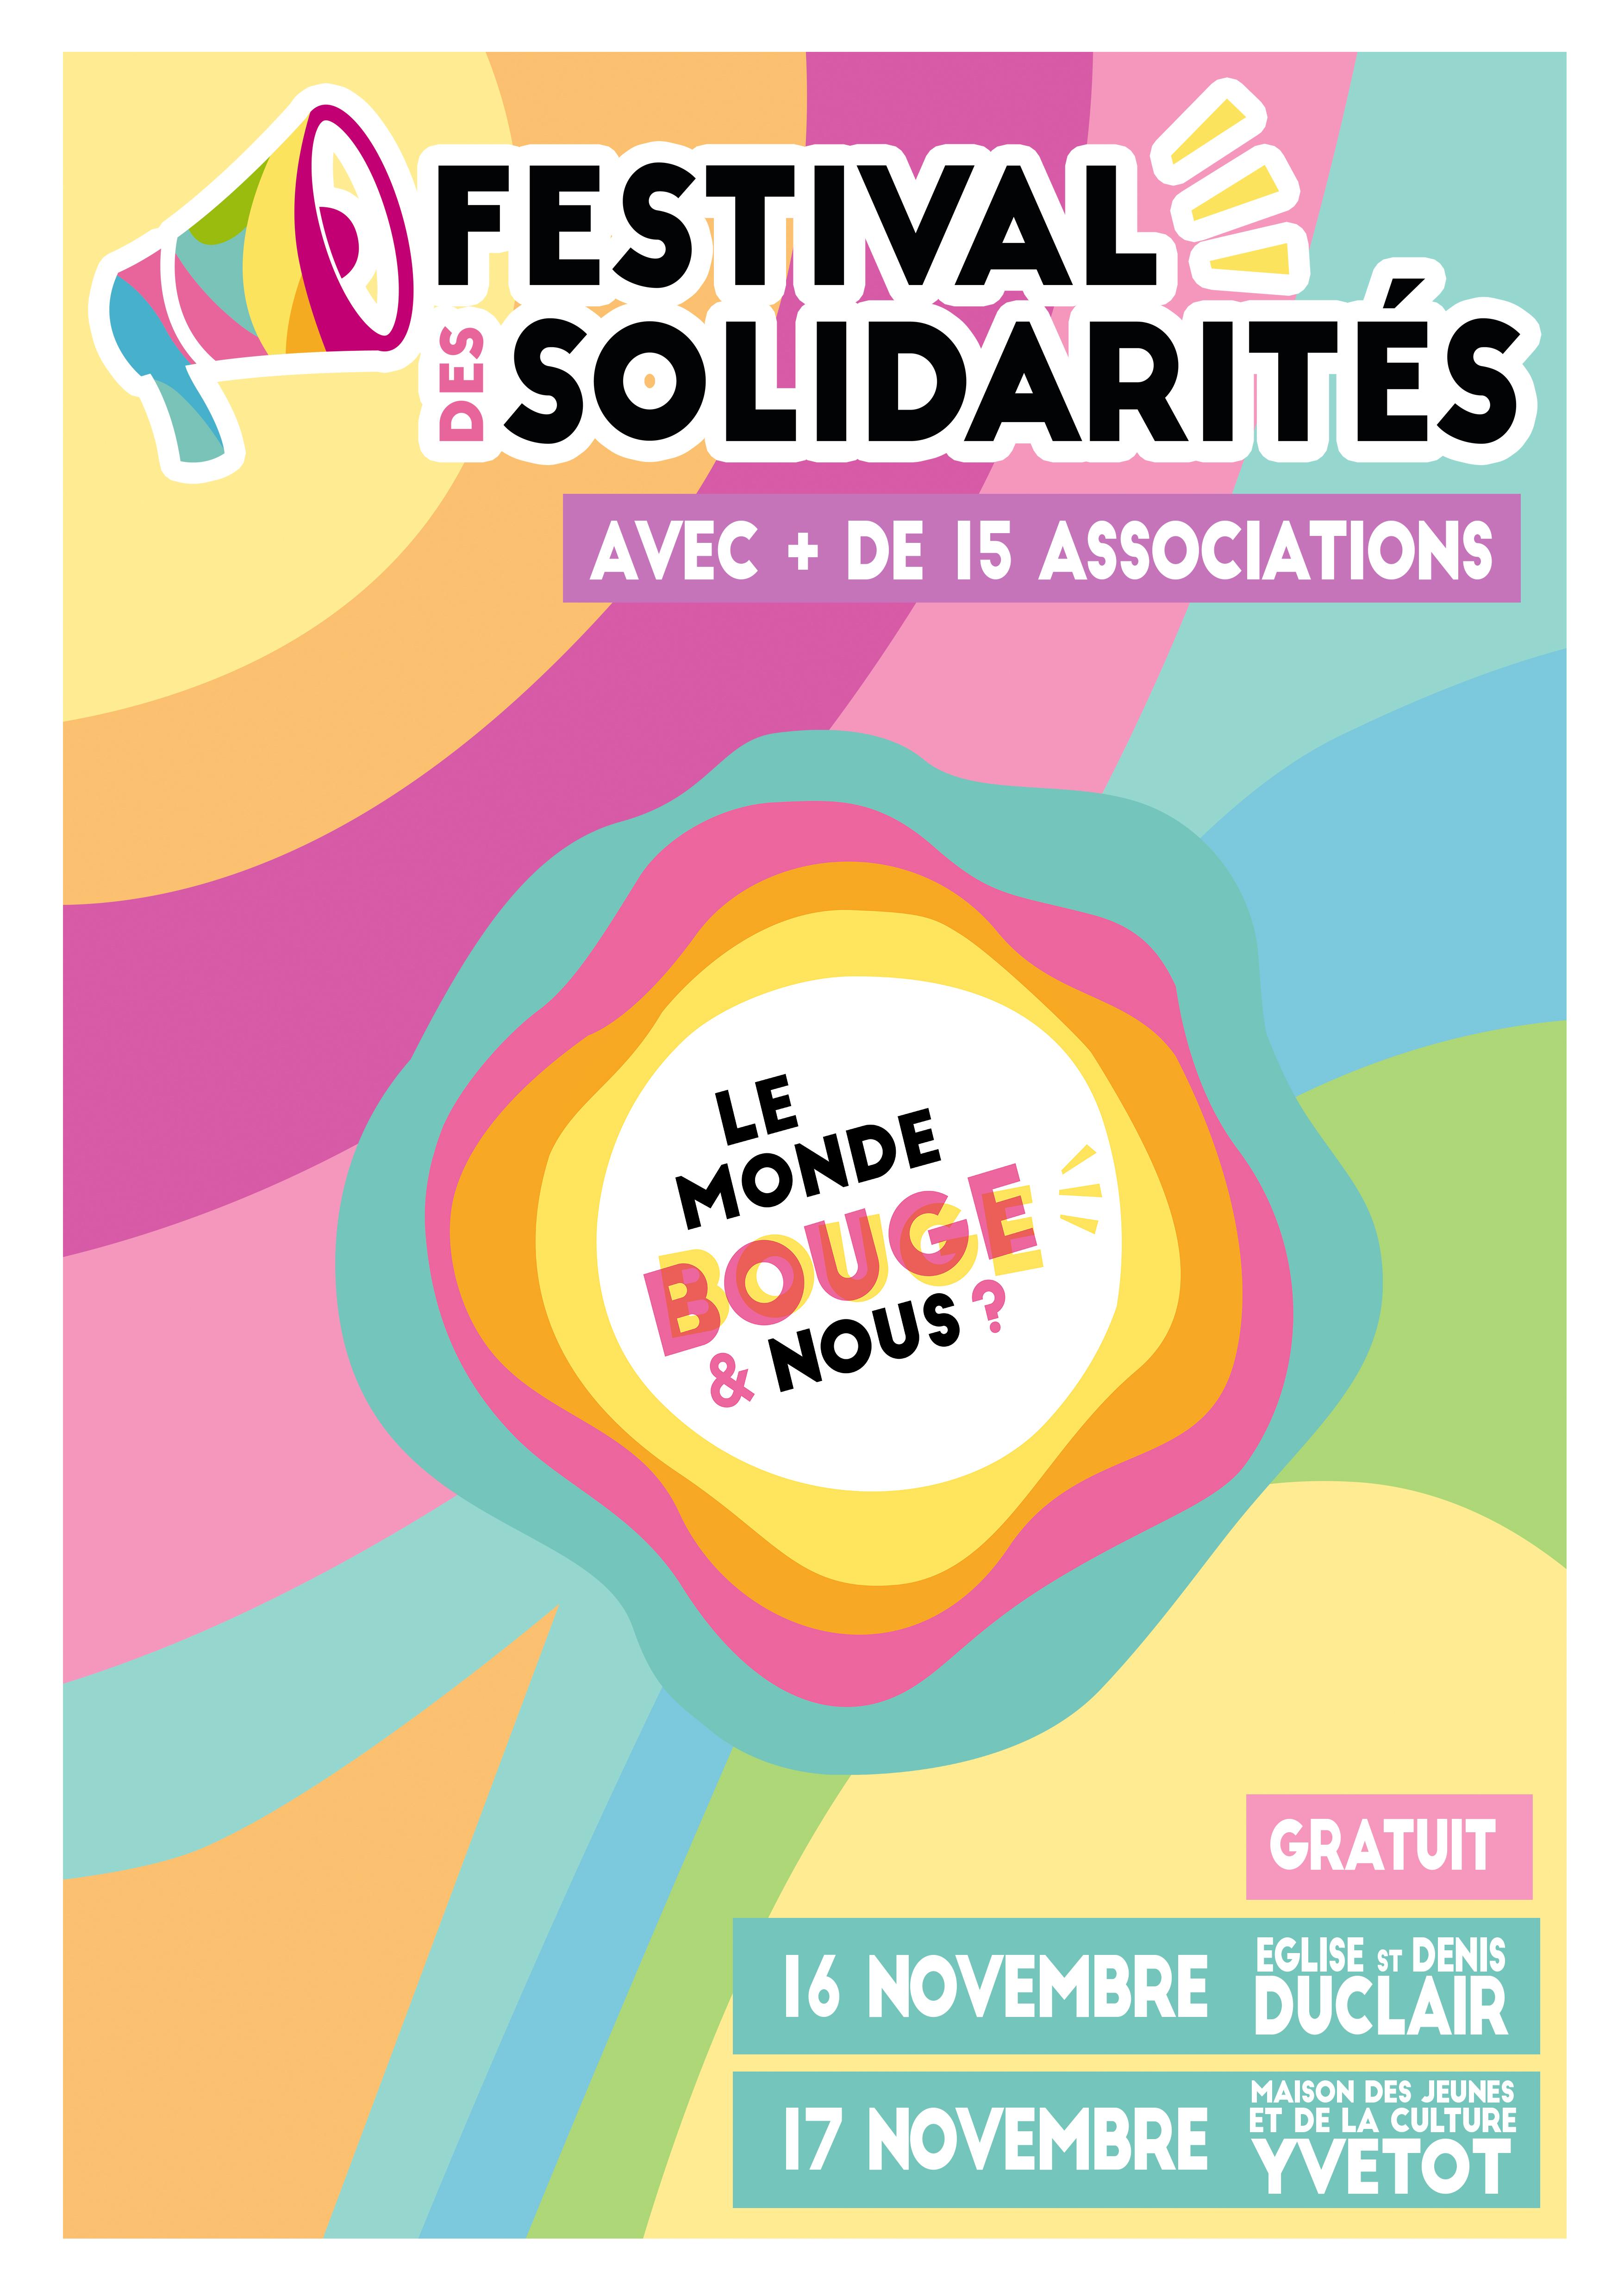 festival des solidarités yvetot duclair